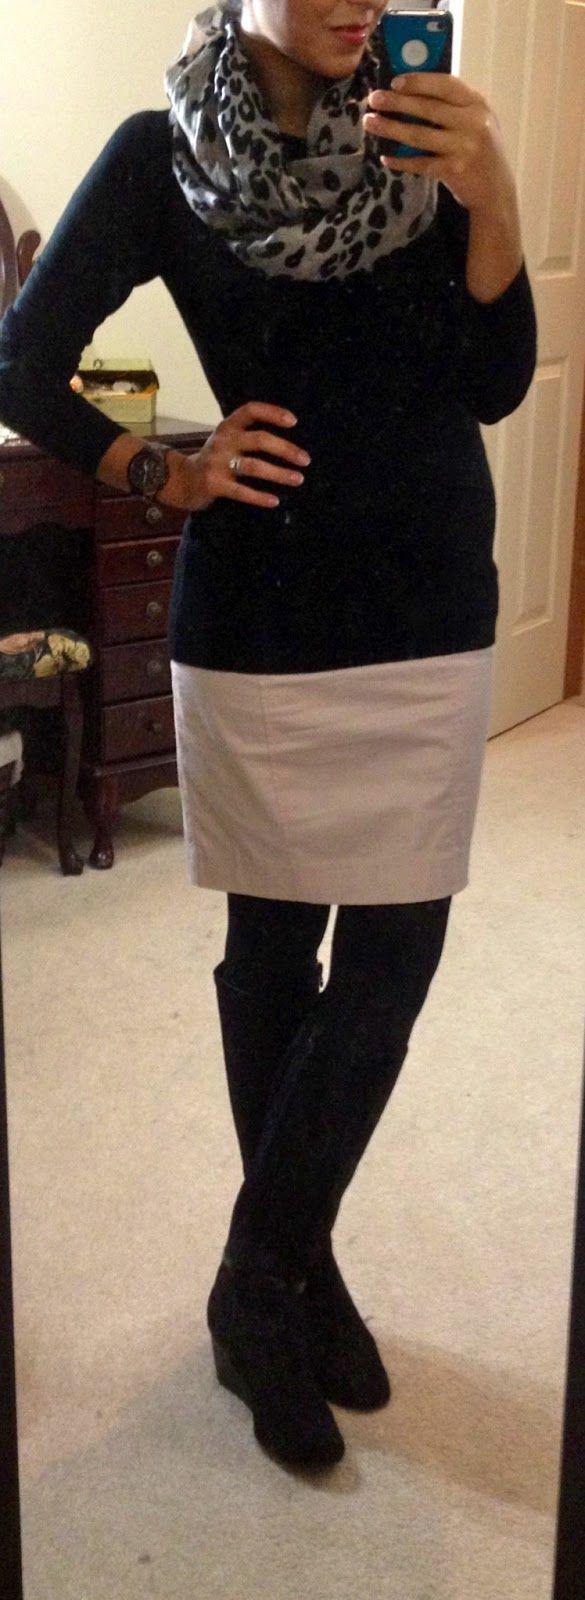 leopard print scarf, black sweater worn over sheath dress, black boots find more women fashion ideas on www.misspool.com